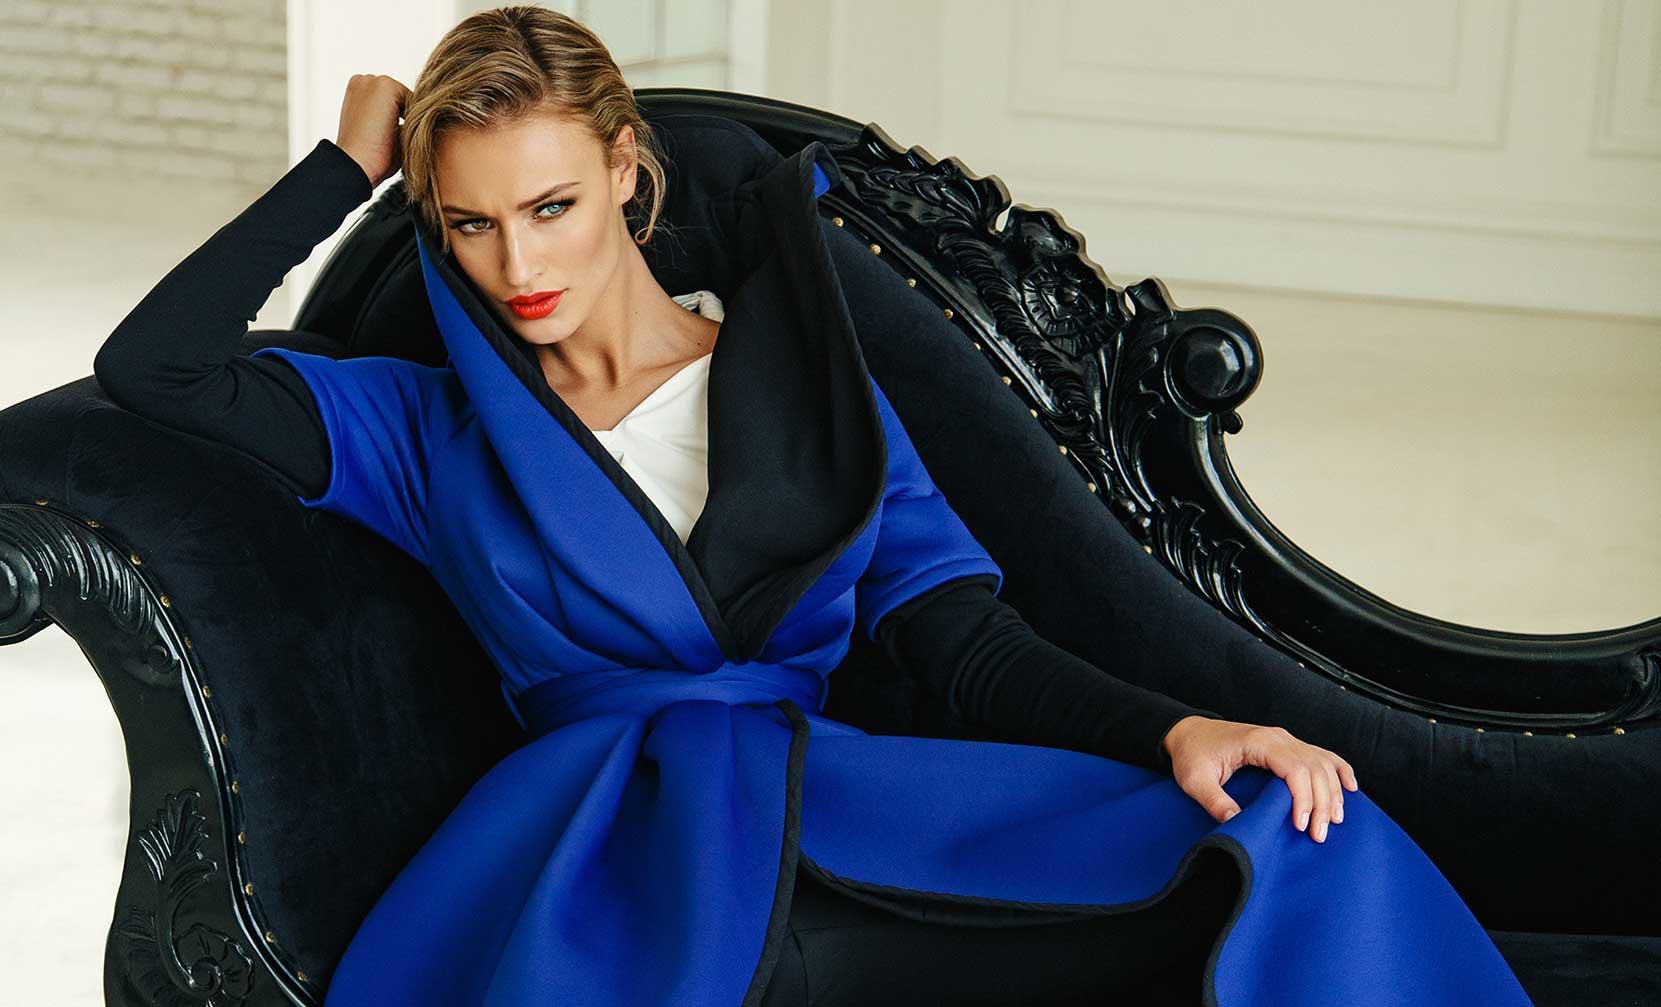 Kabát HannaH kolekce 2020 #chytramoda